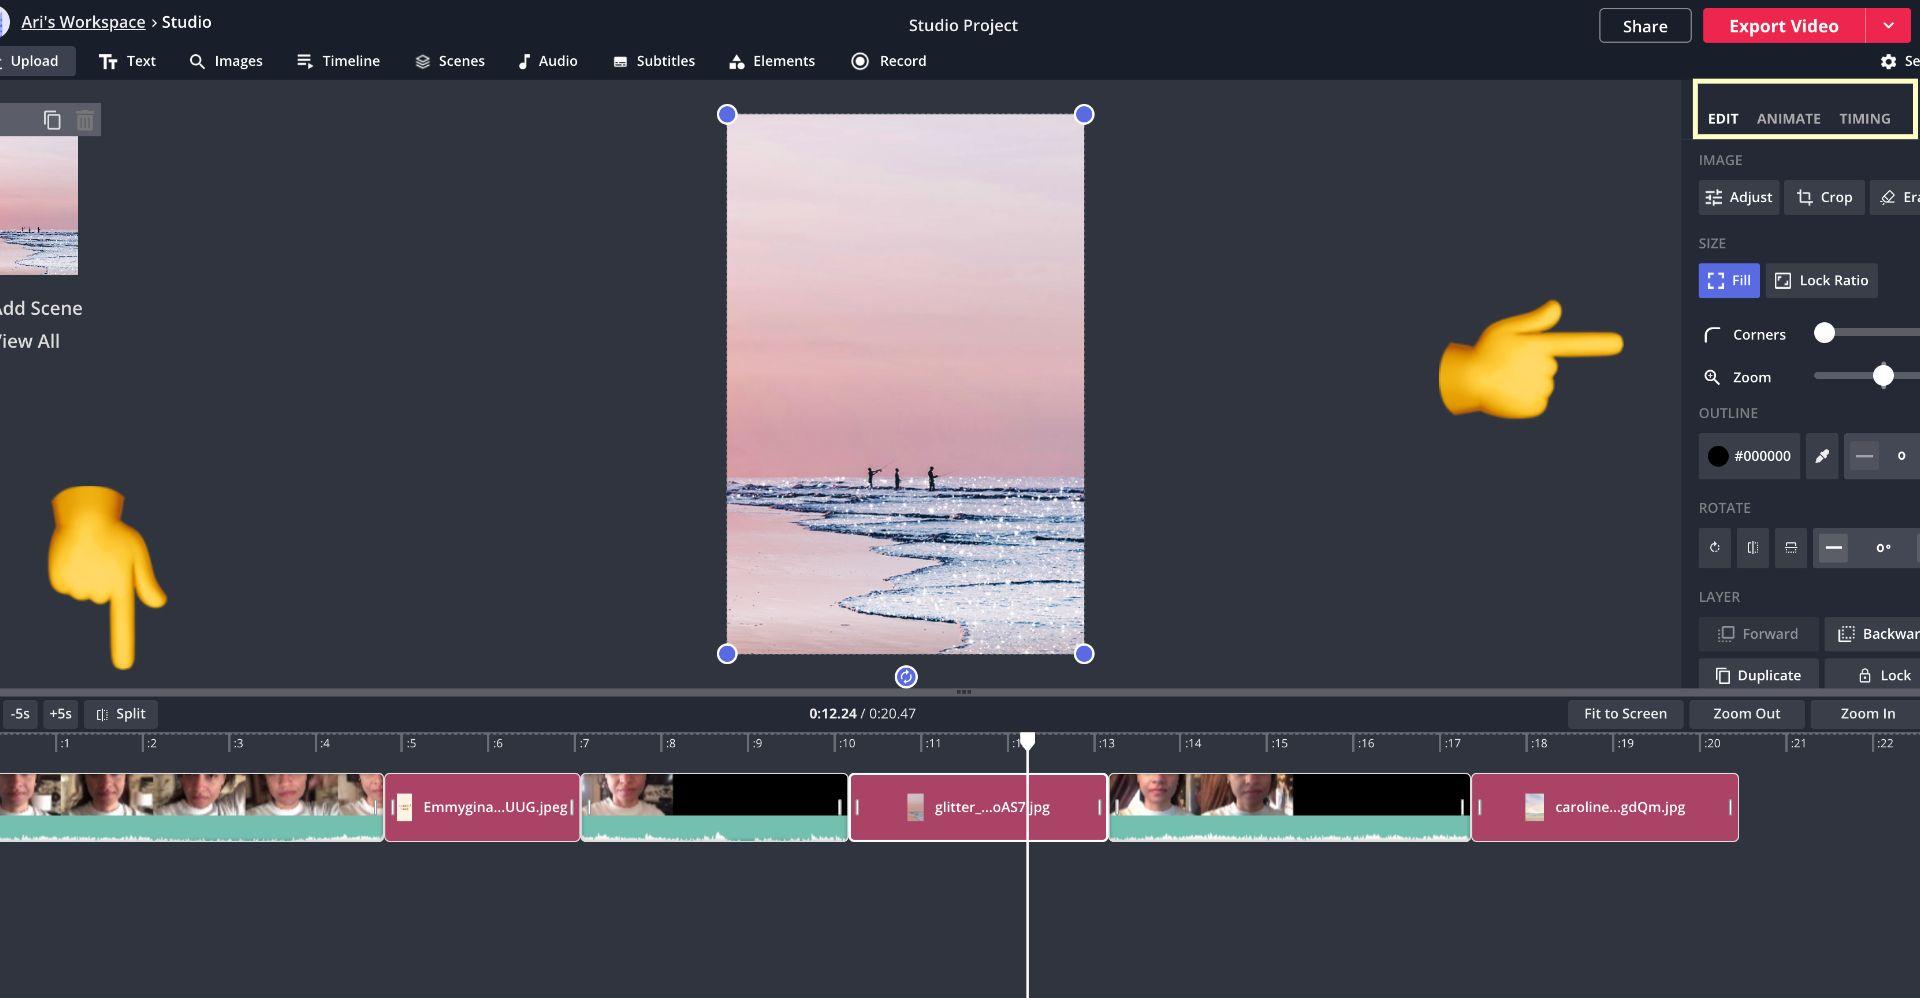 screenshot of Kapwing Studio with emoji arrows pointing to the split tool